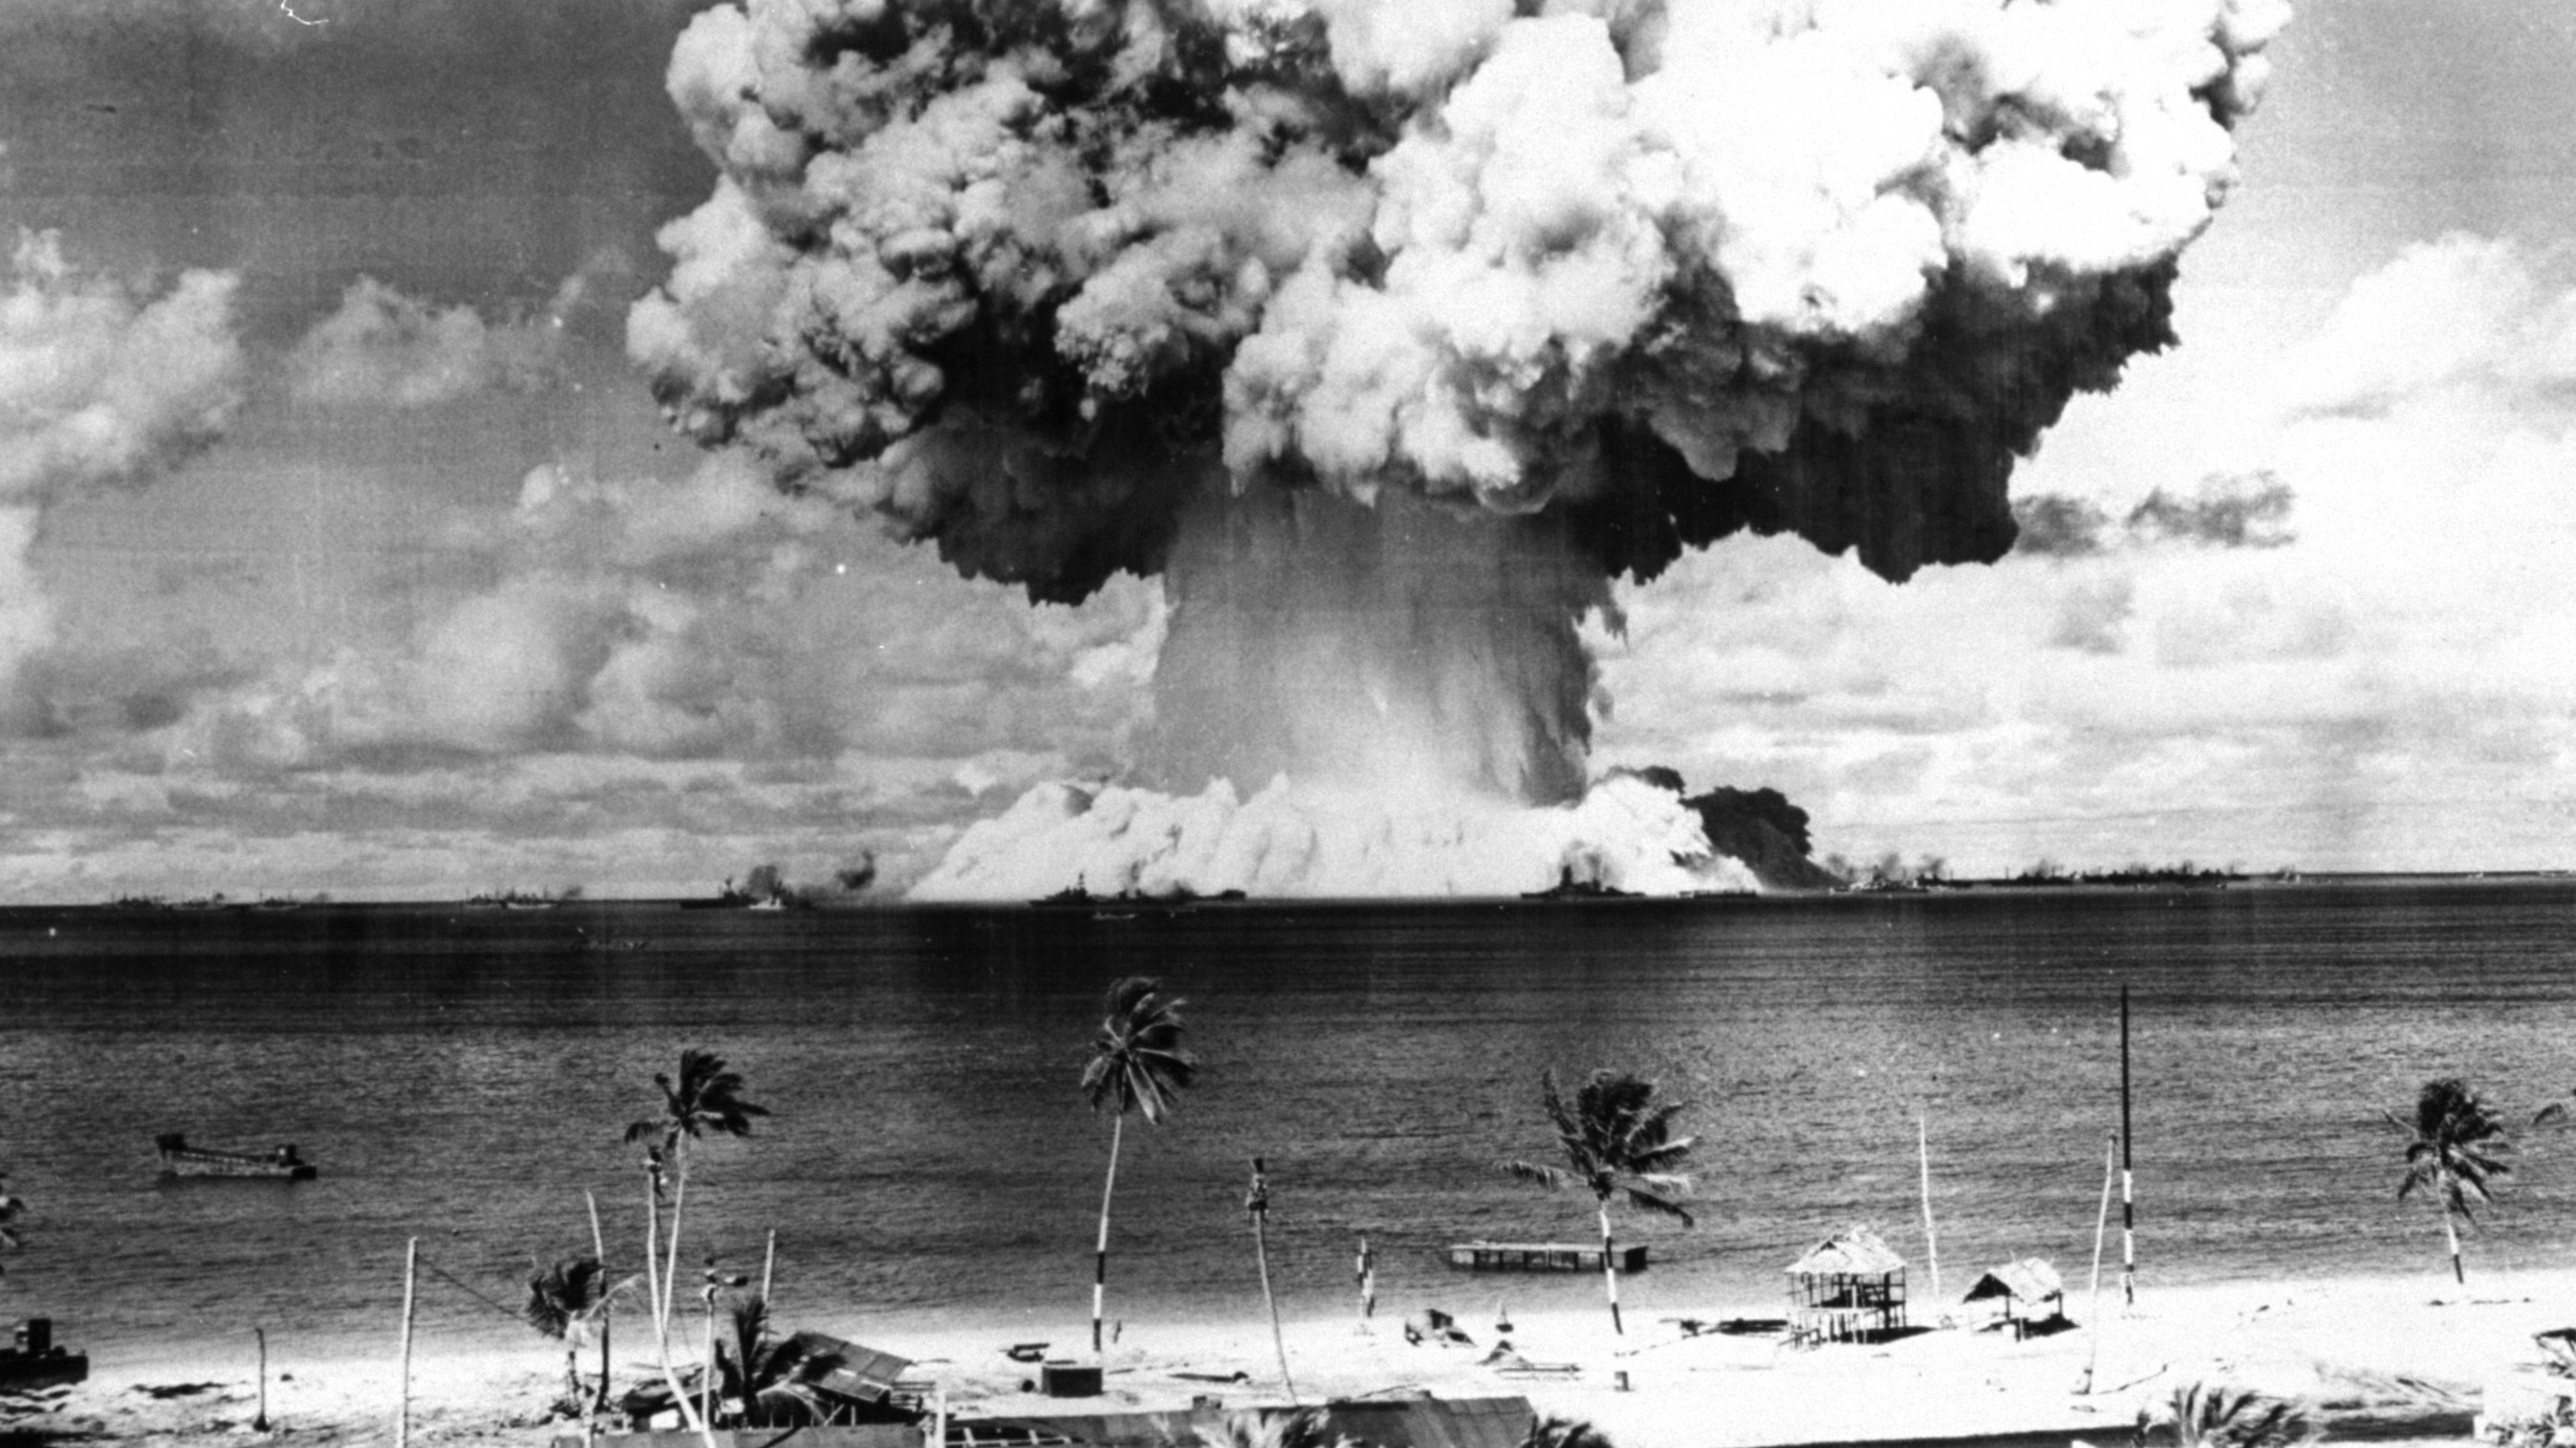 Exist? Bikini atoll nuclear tests what phrase